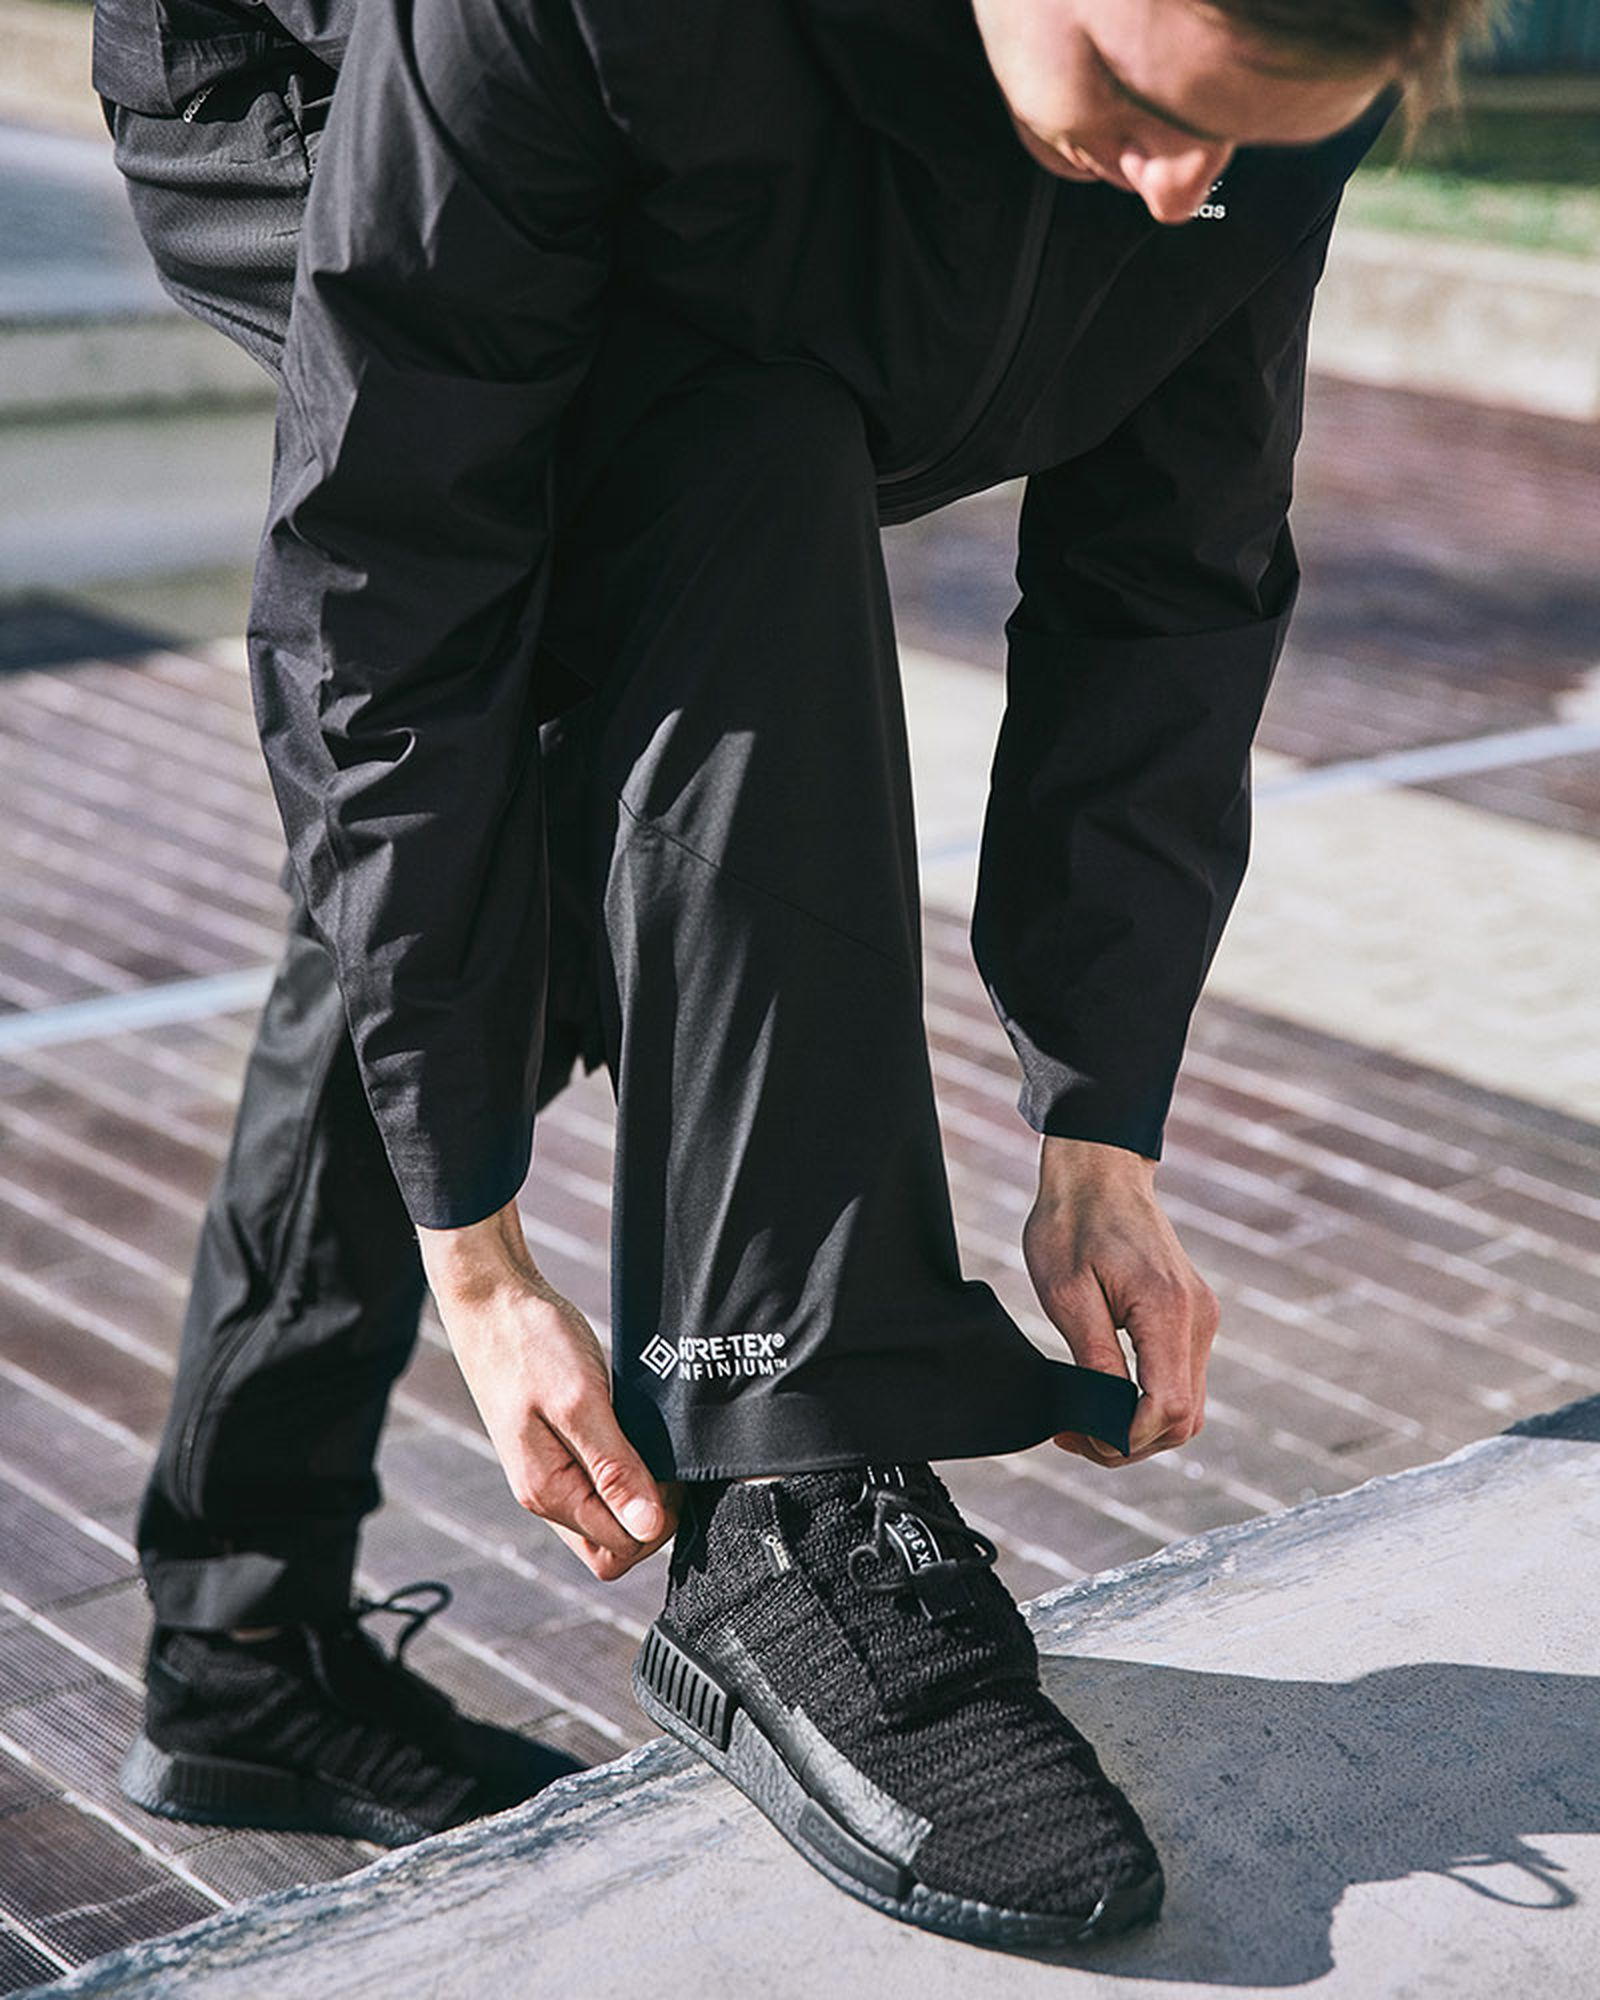 gore tex adidas originals pt3 acmon collection Conroy Nachtigall gore-tex